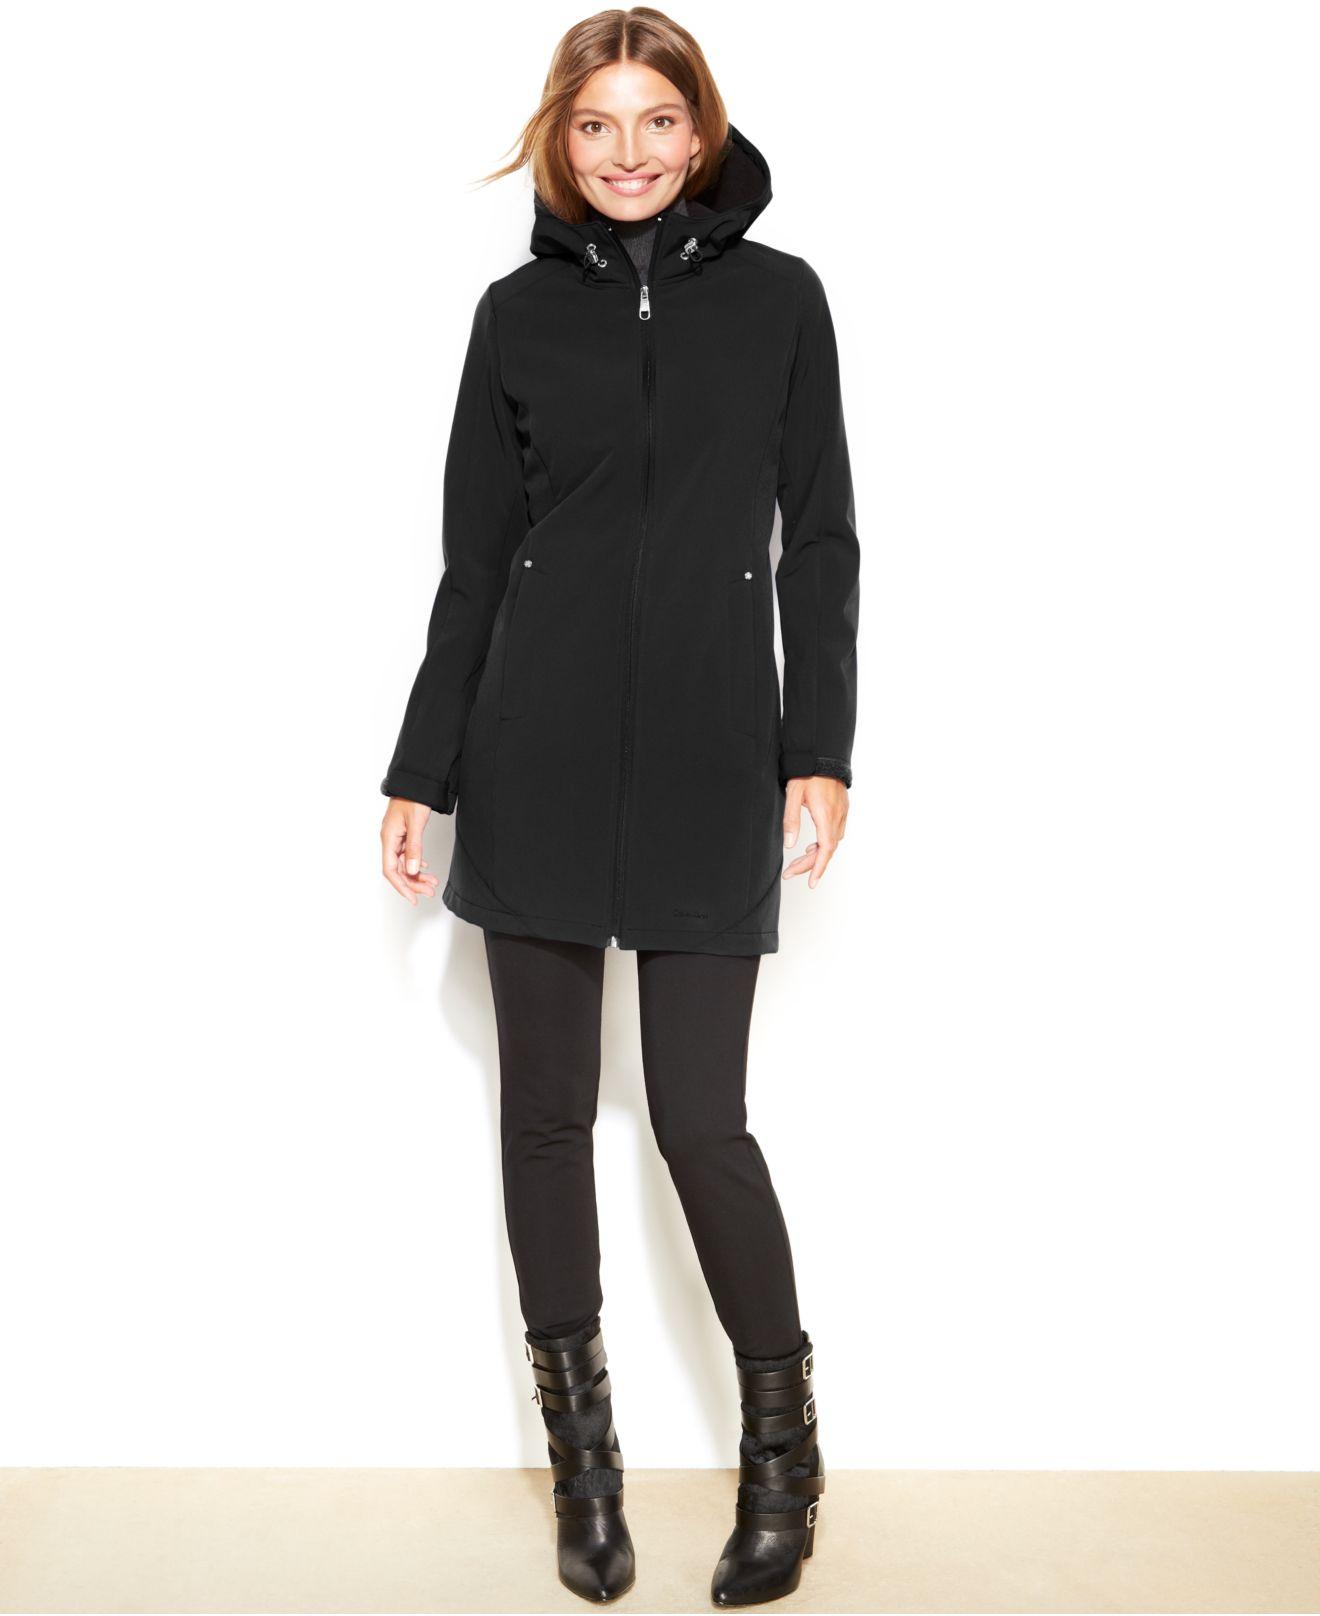 Calvin klein Petite Hooded Soft Shell Raincoat in Black   Lyst